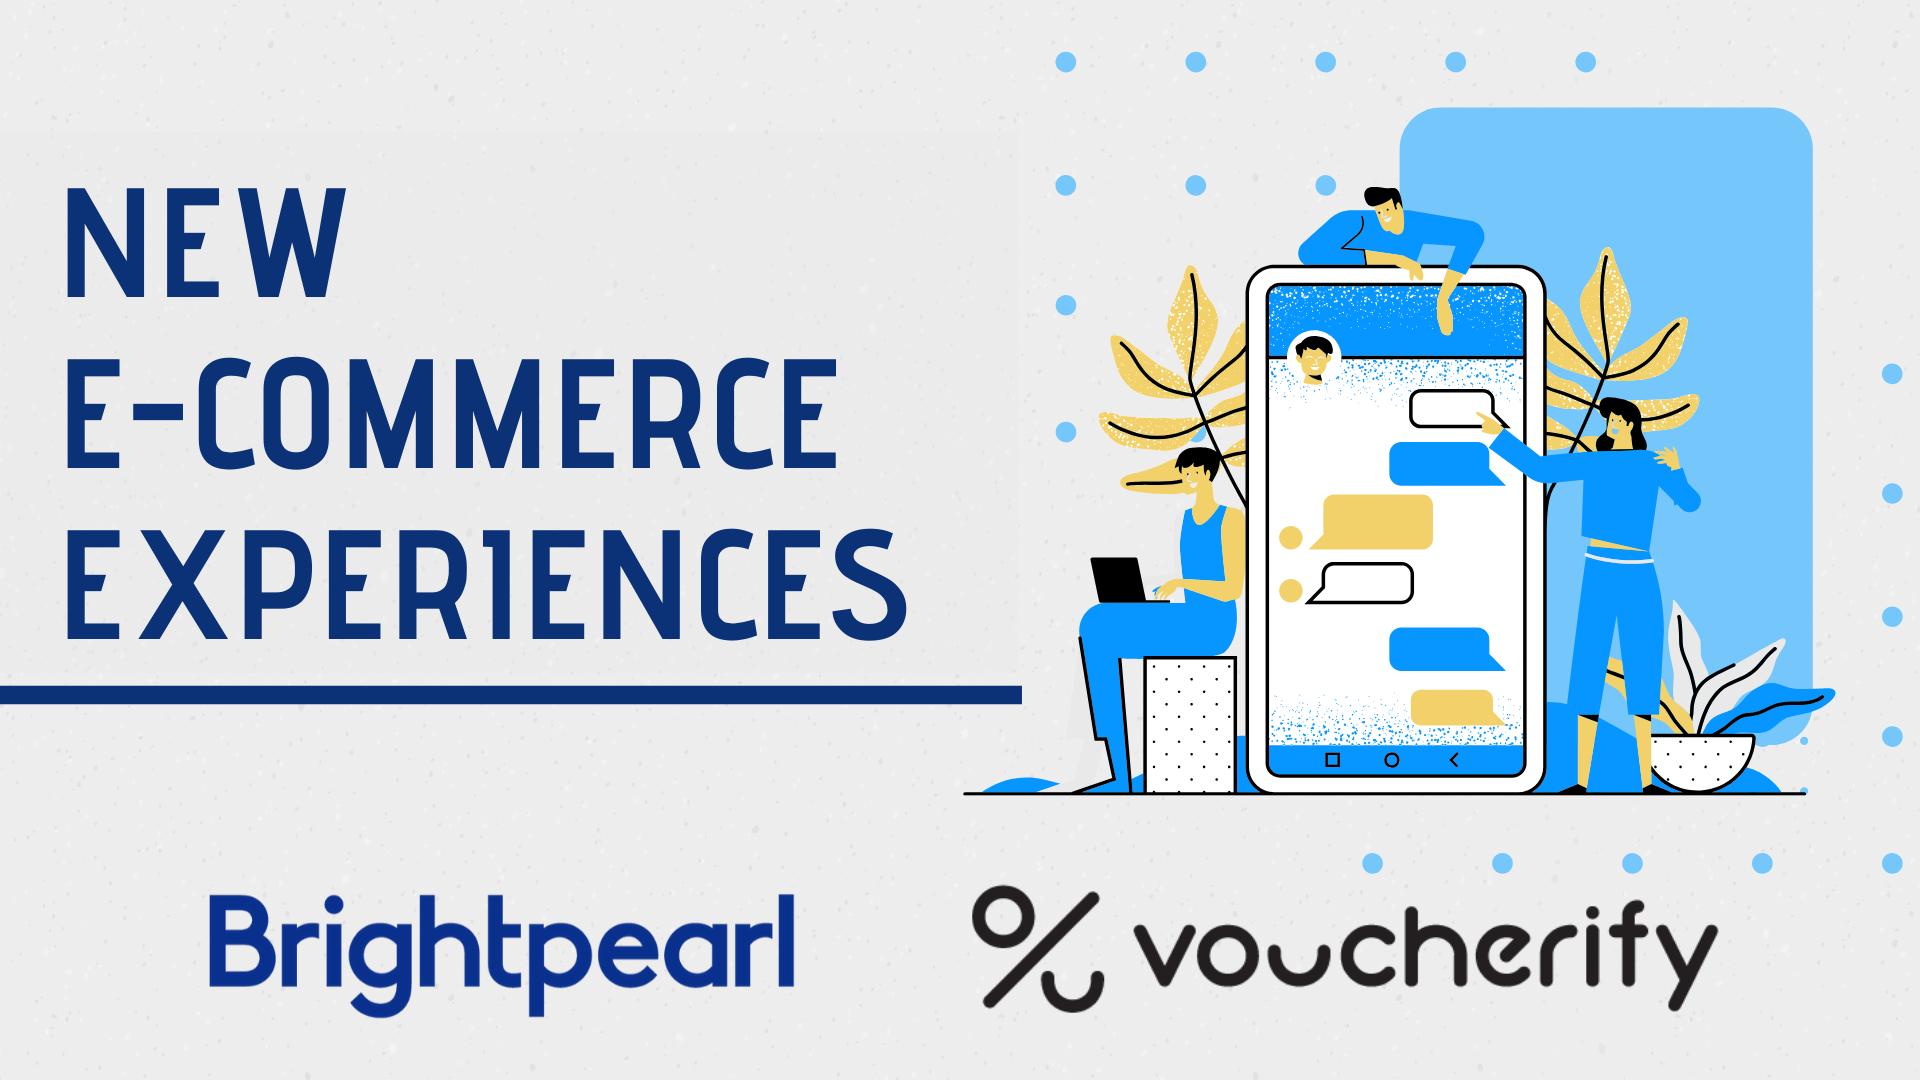 Deliver unique e-commerce experiences with Brightpearl and Voucherify